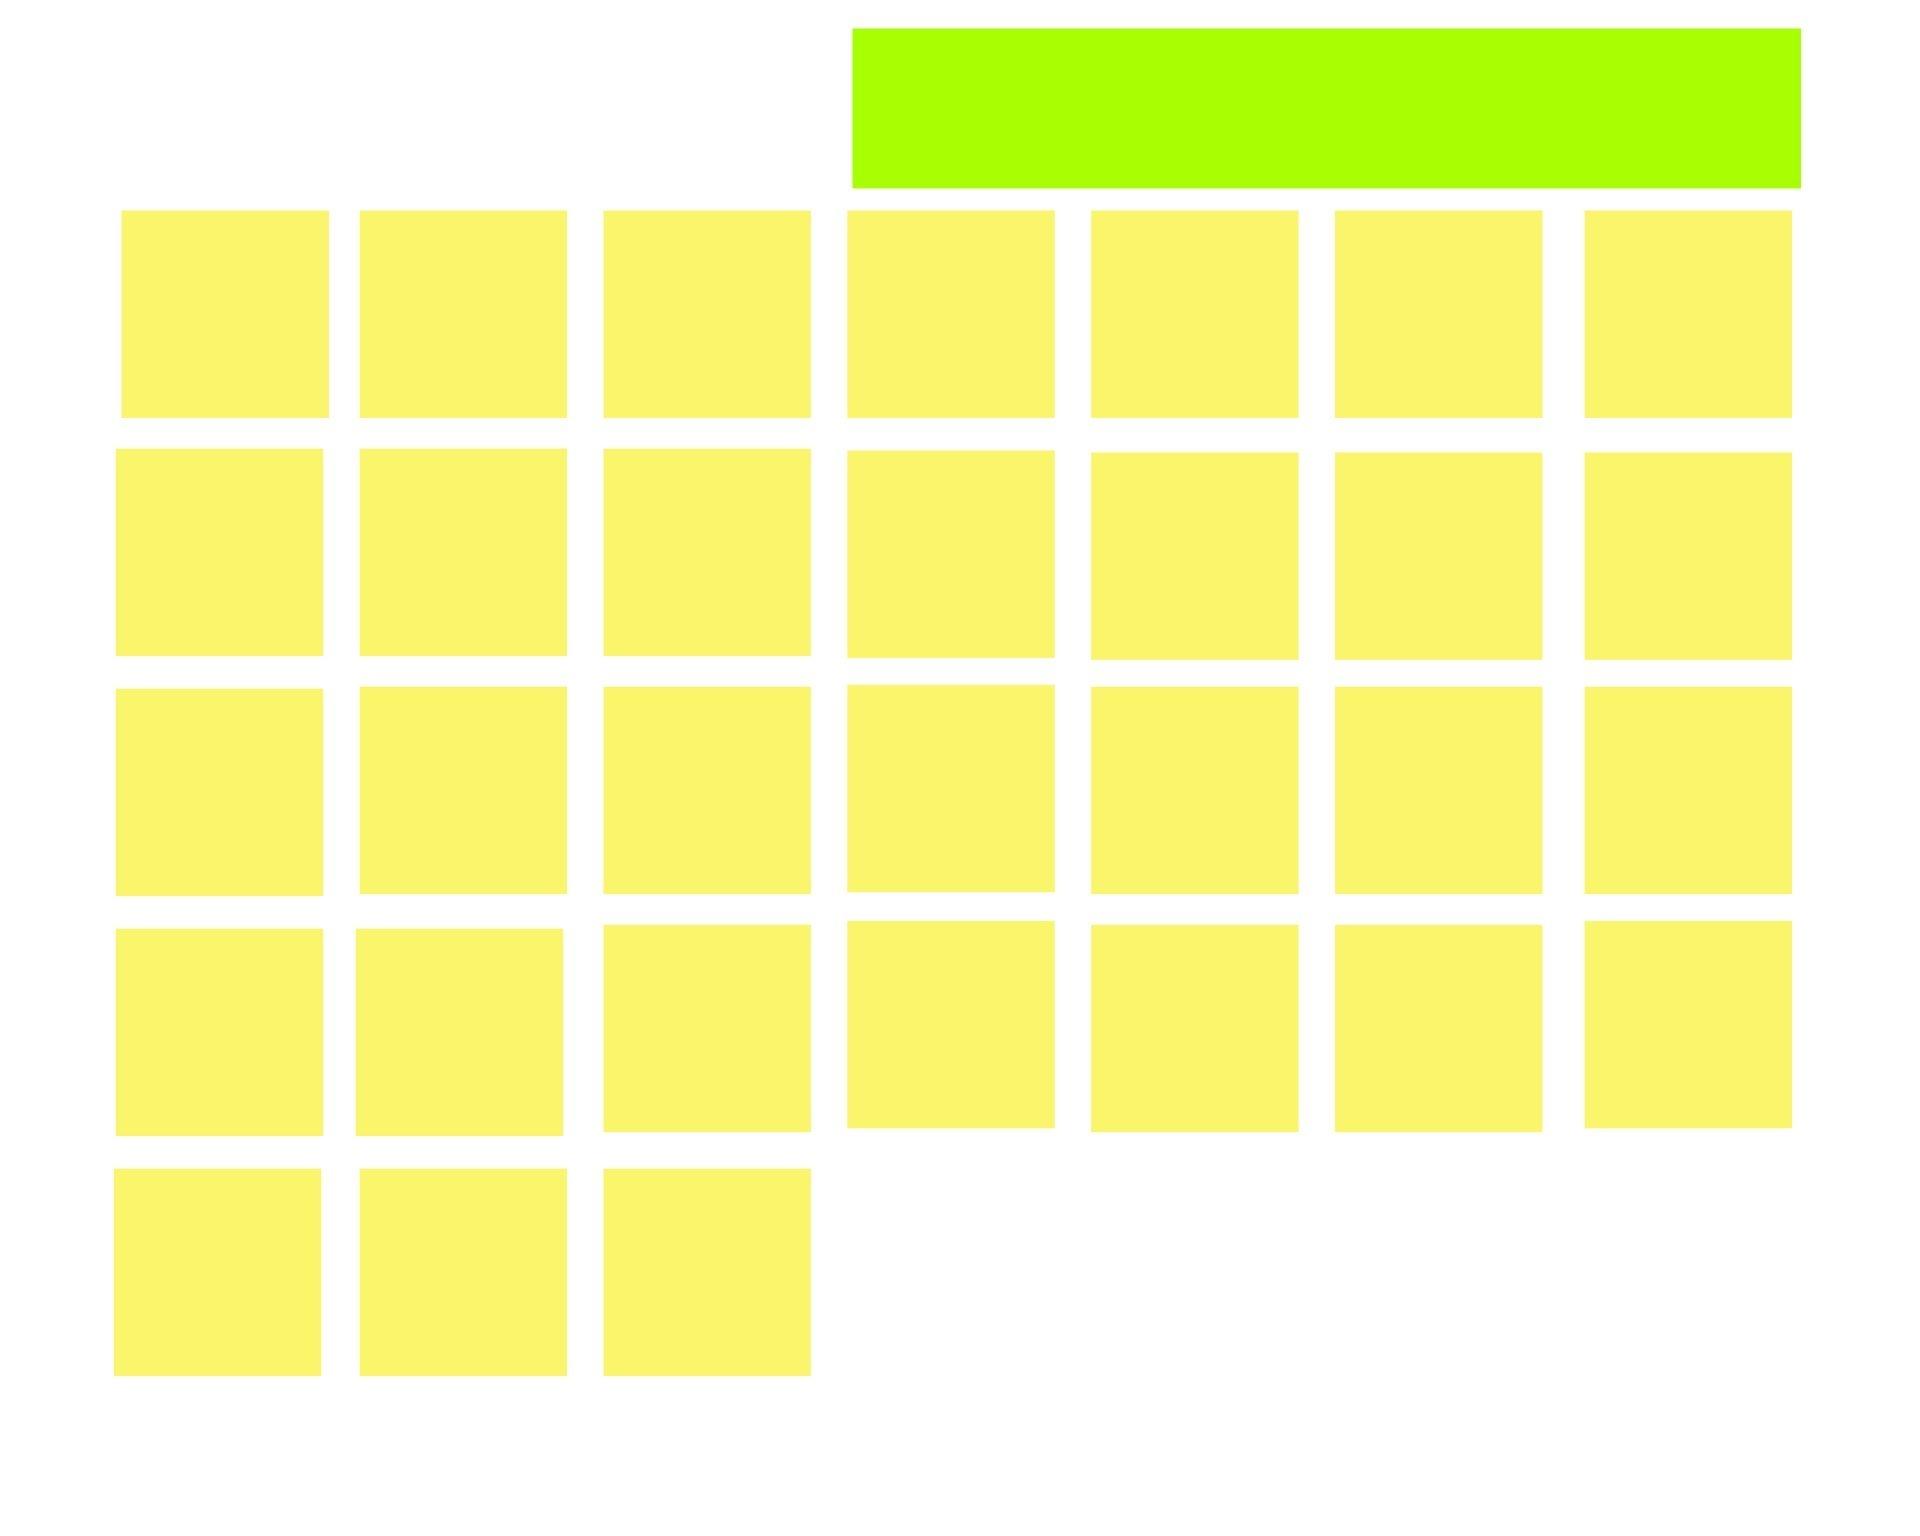 Blank 31 Day Calendar Month Free Stock Photo - Public Domain